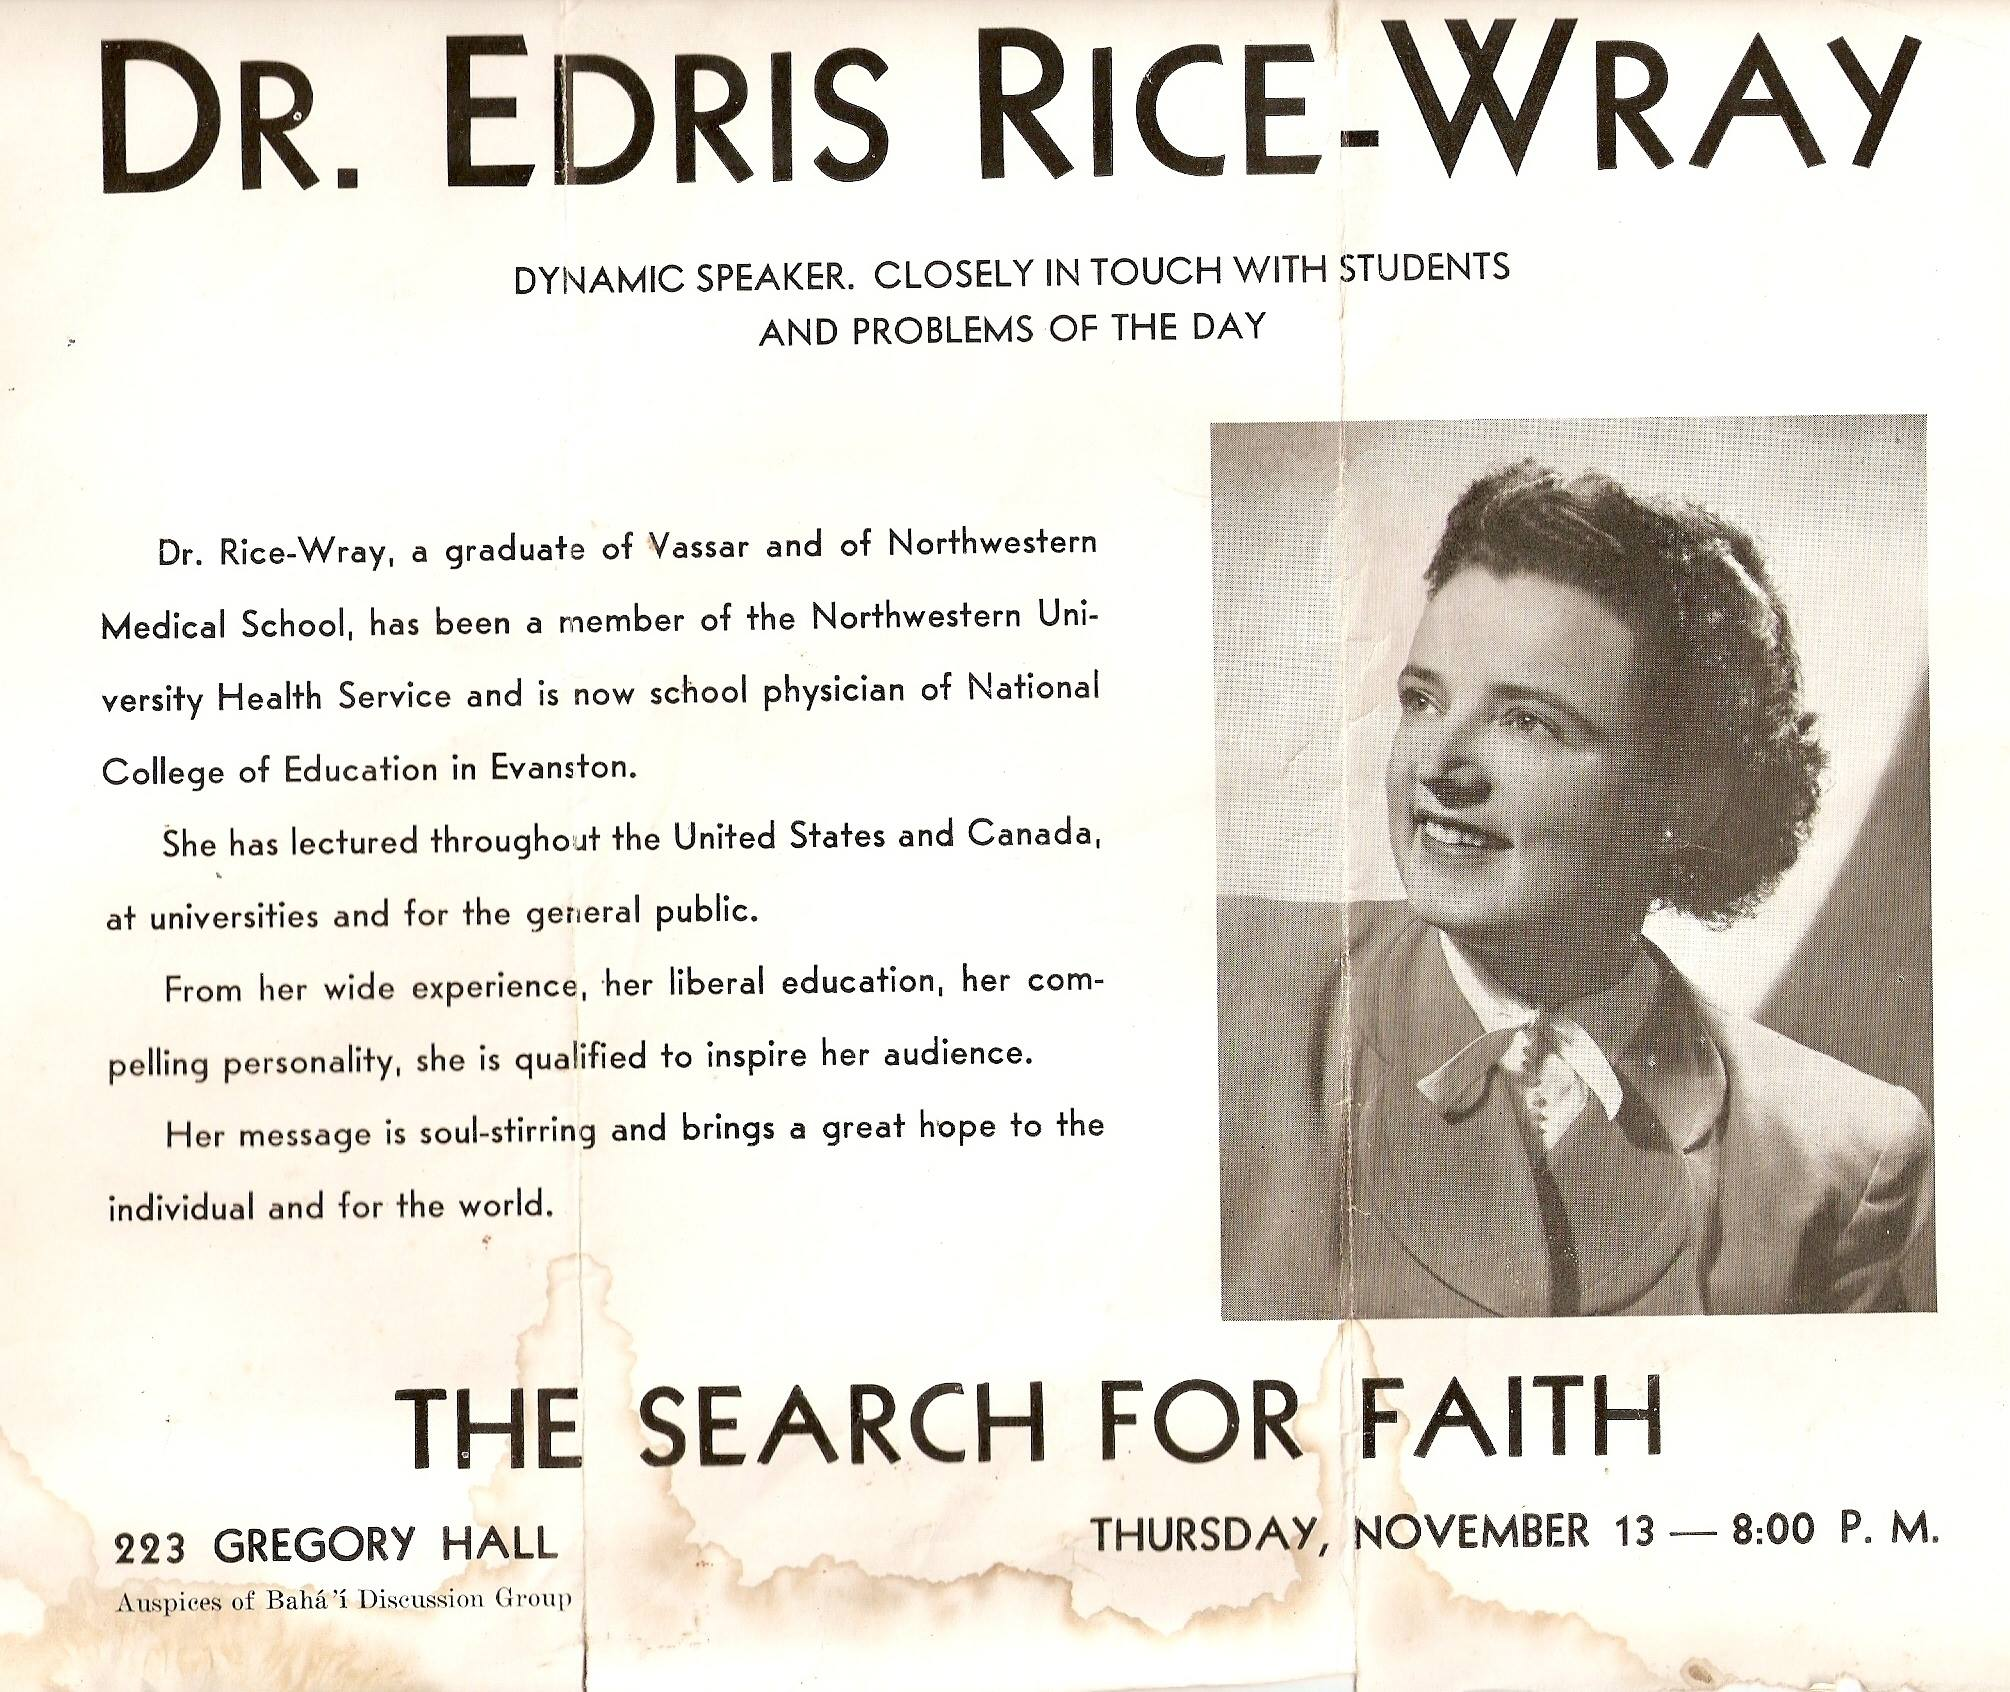 Diplima de Vassar y Nothweastern para la Dra. Edris Rice-Wray